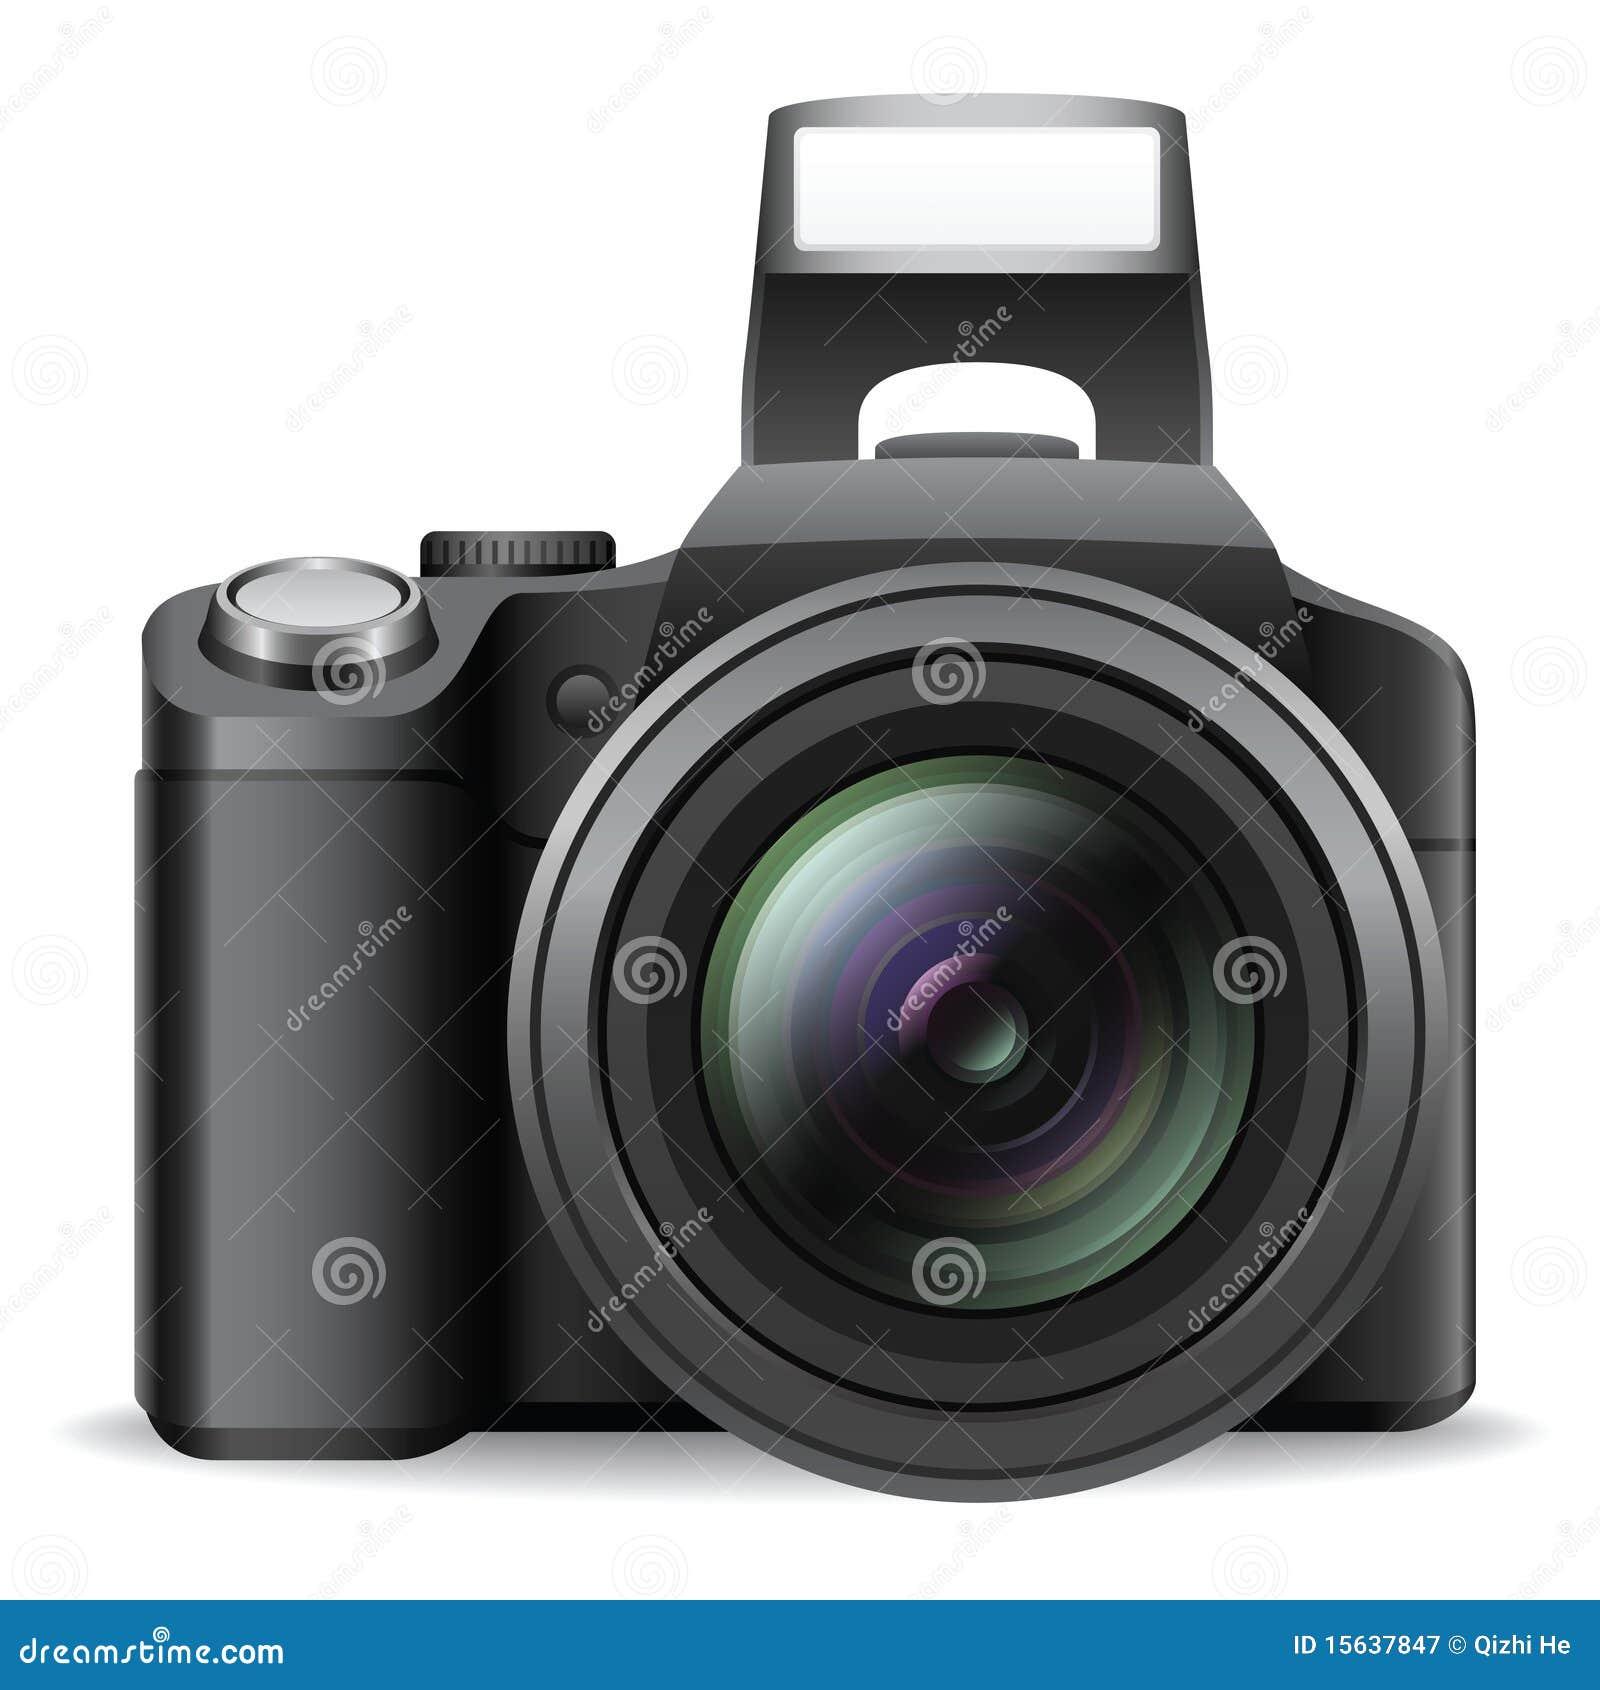 free clipart slr camera - photo #14